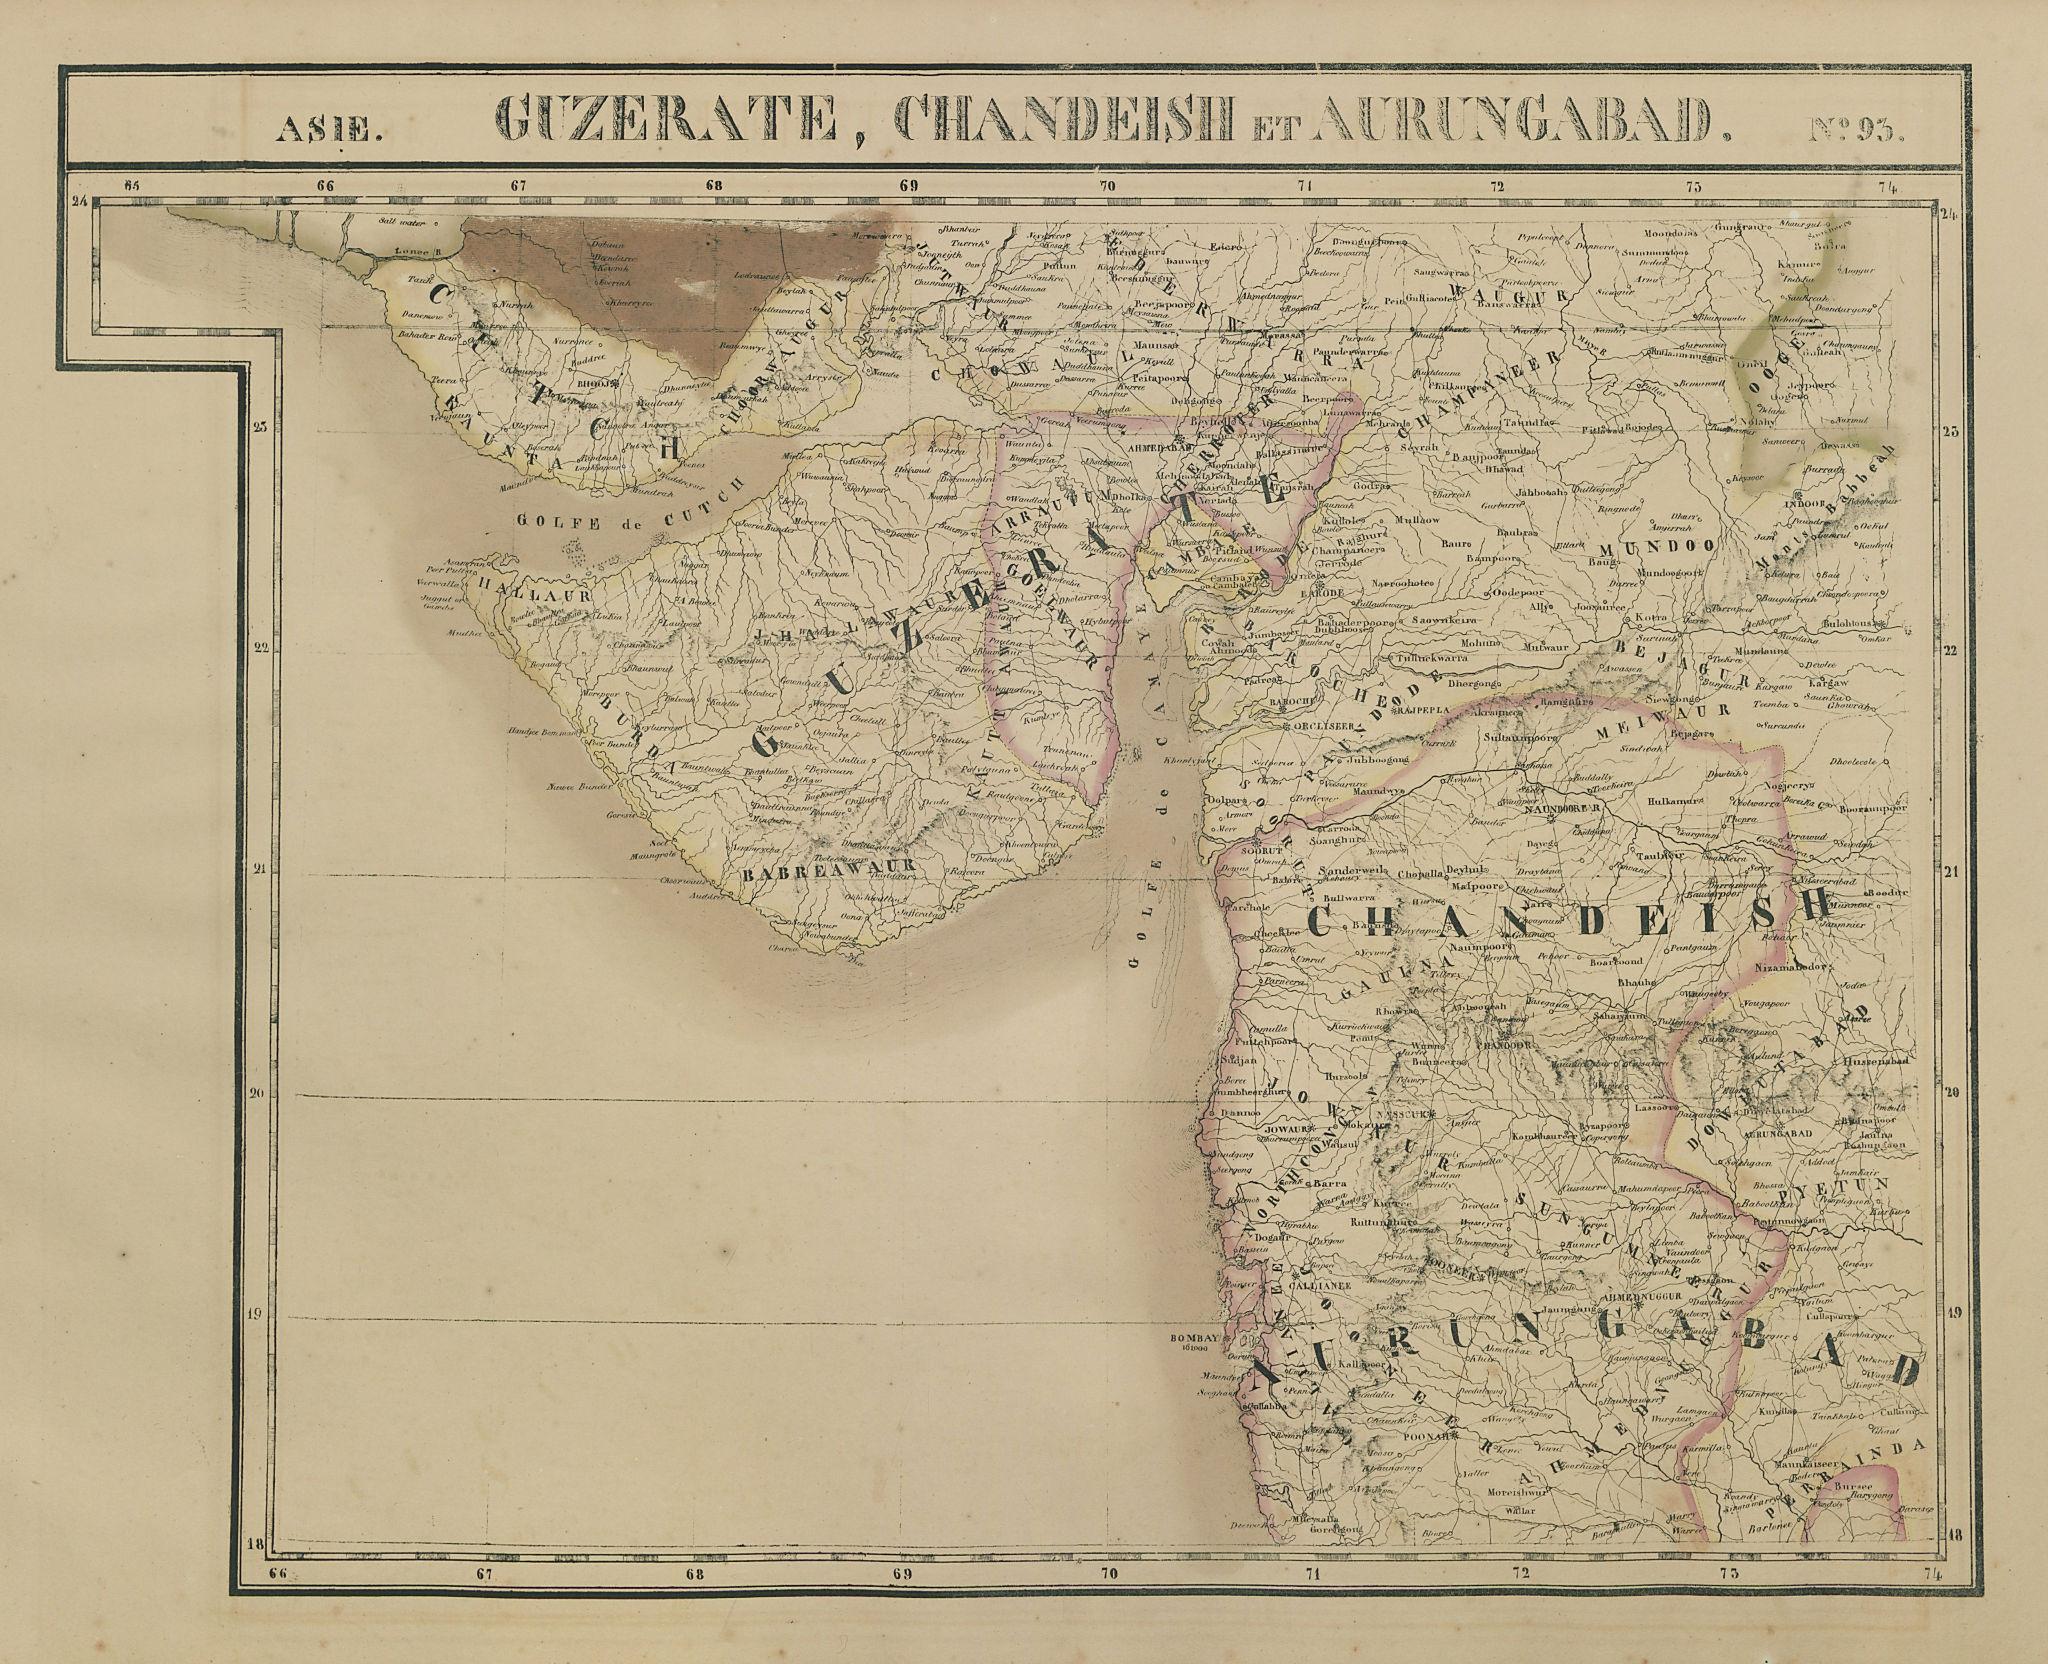 Asie Guzerate Chandeish Aurungabad 93 India Gujarat Mumbai VANDERMAELEN 1827 map